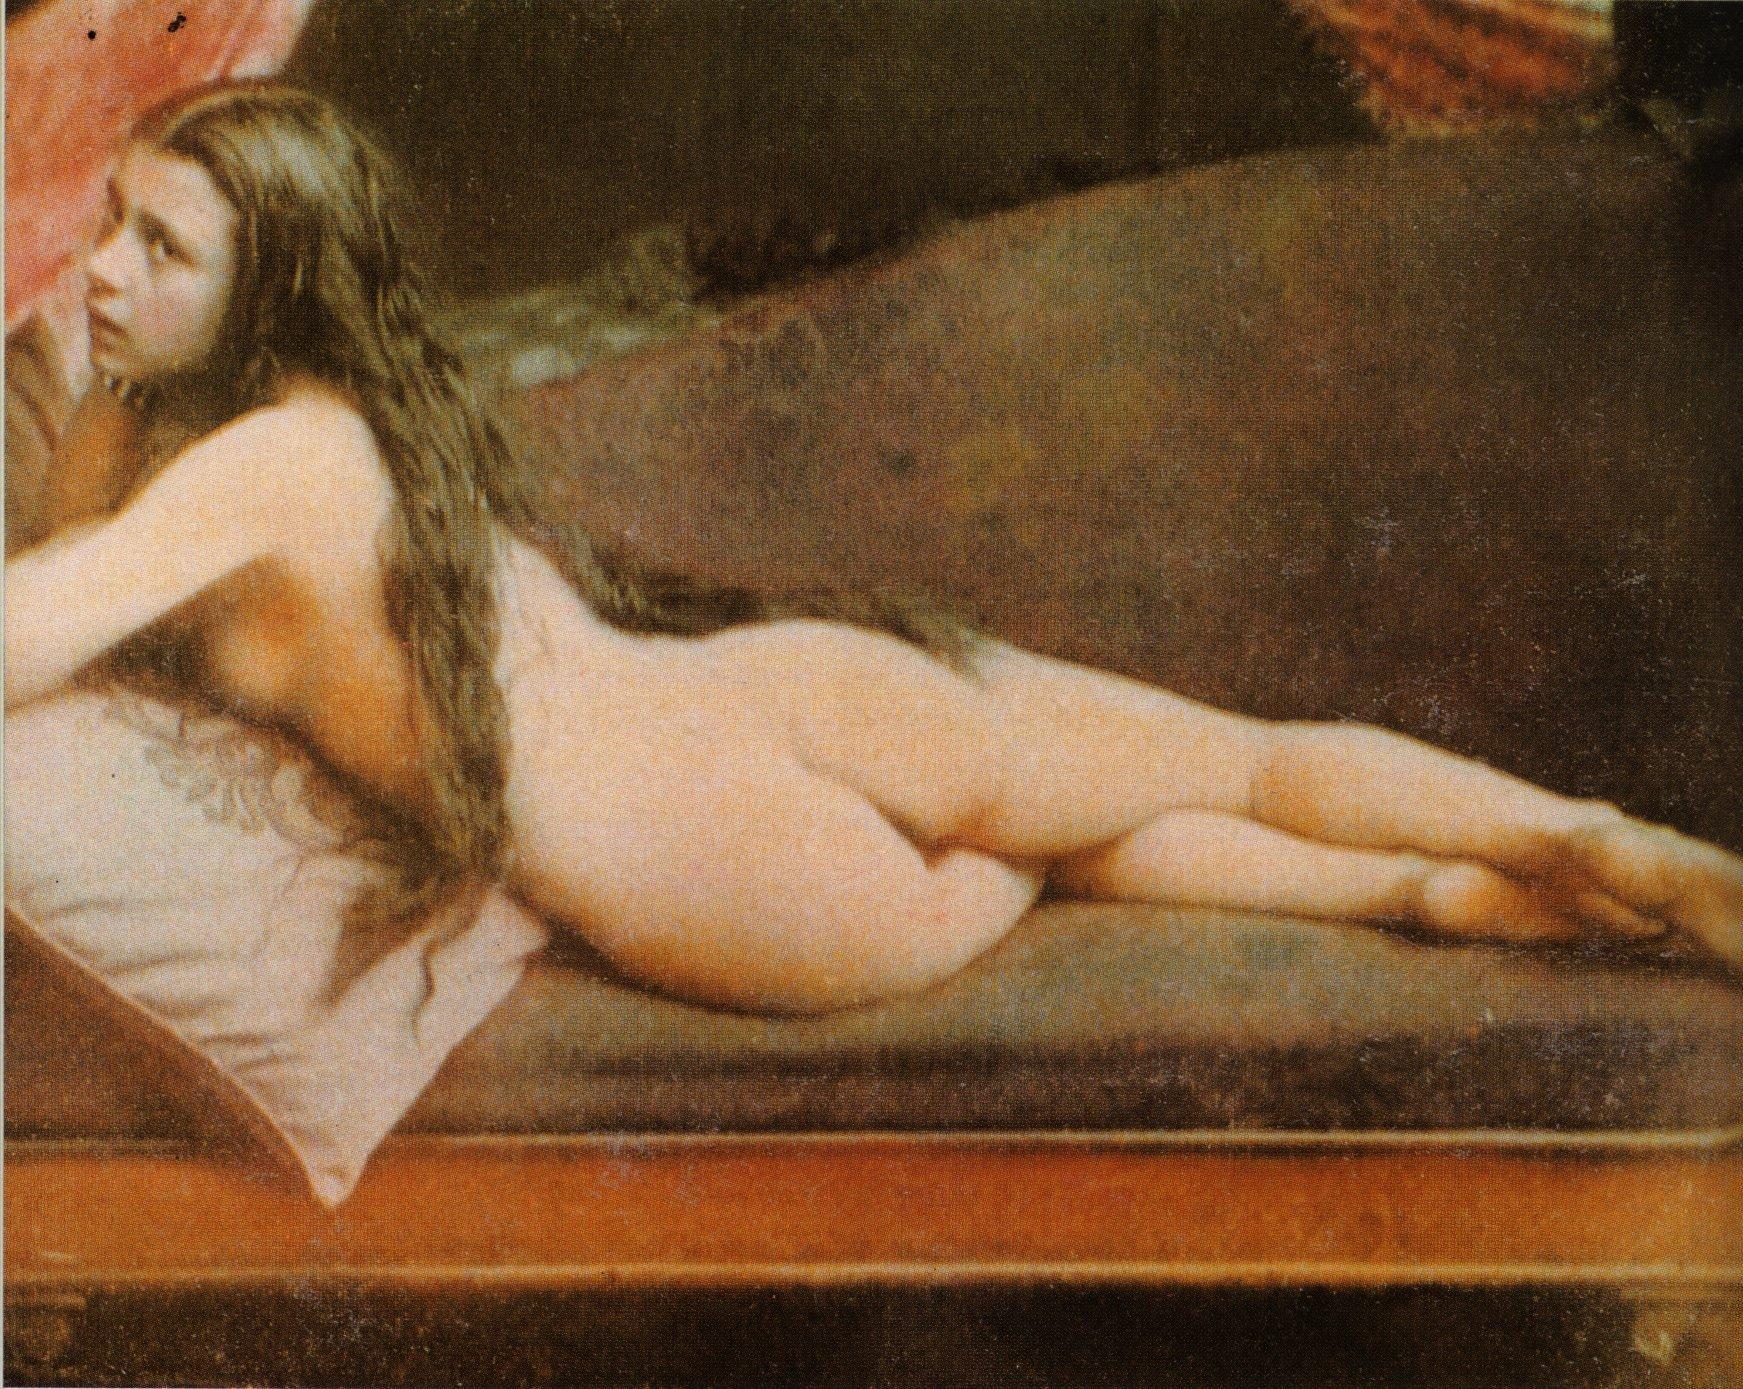 Erotic nude male photos ca 1900